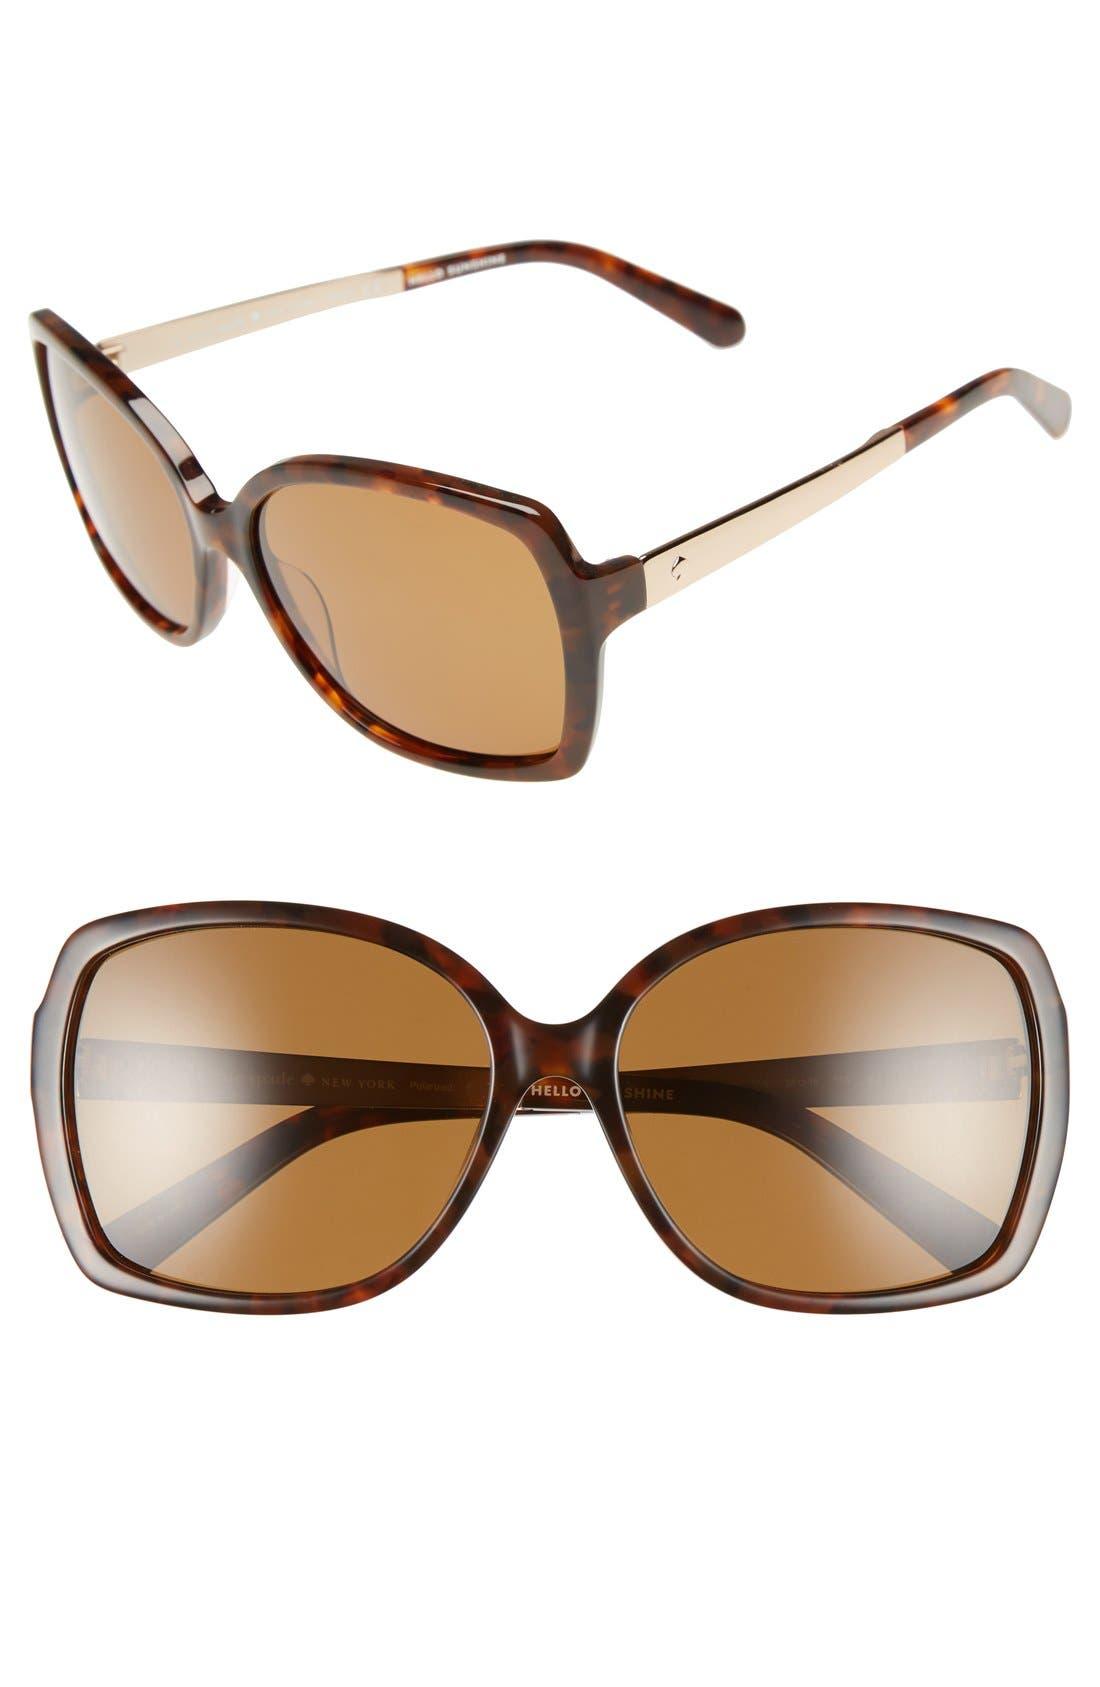 Main Image - kate spade new york 'darilynn' 58mm polarized sunglasses